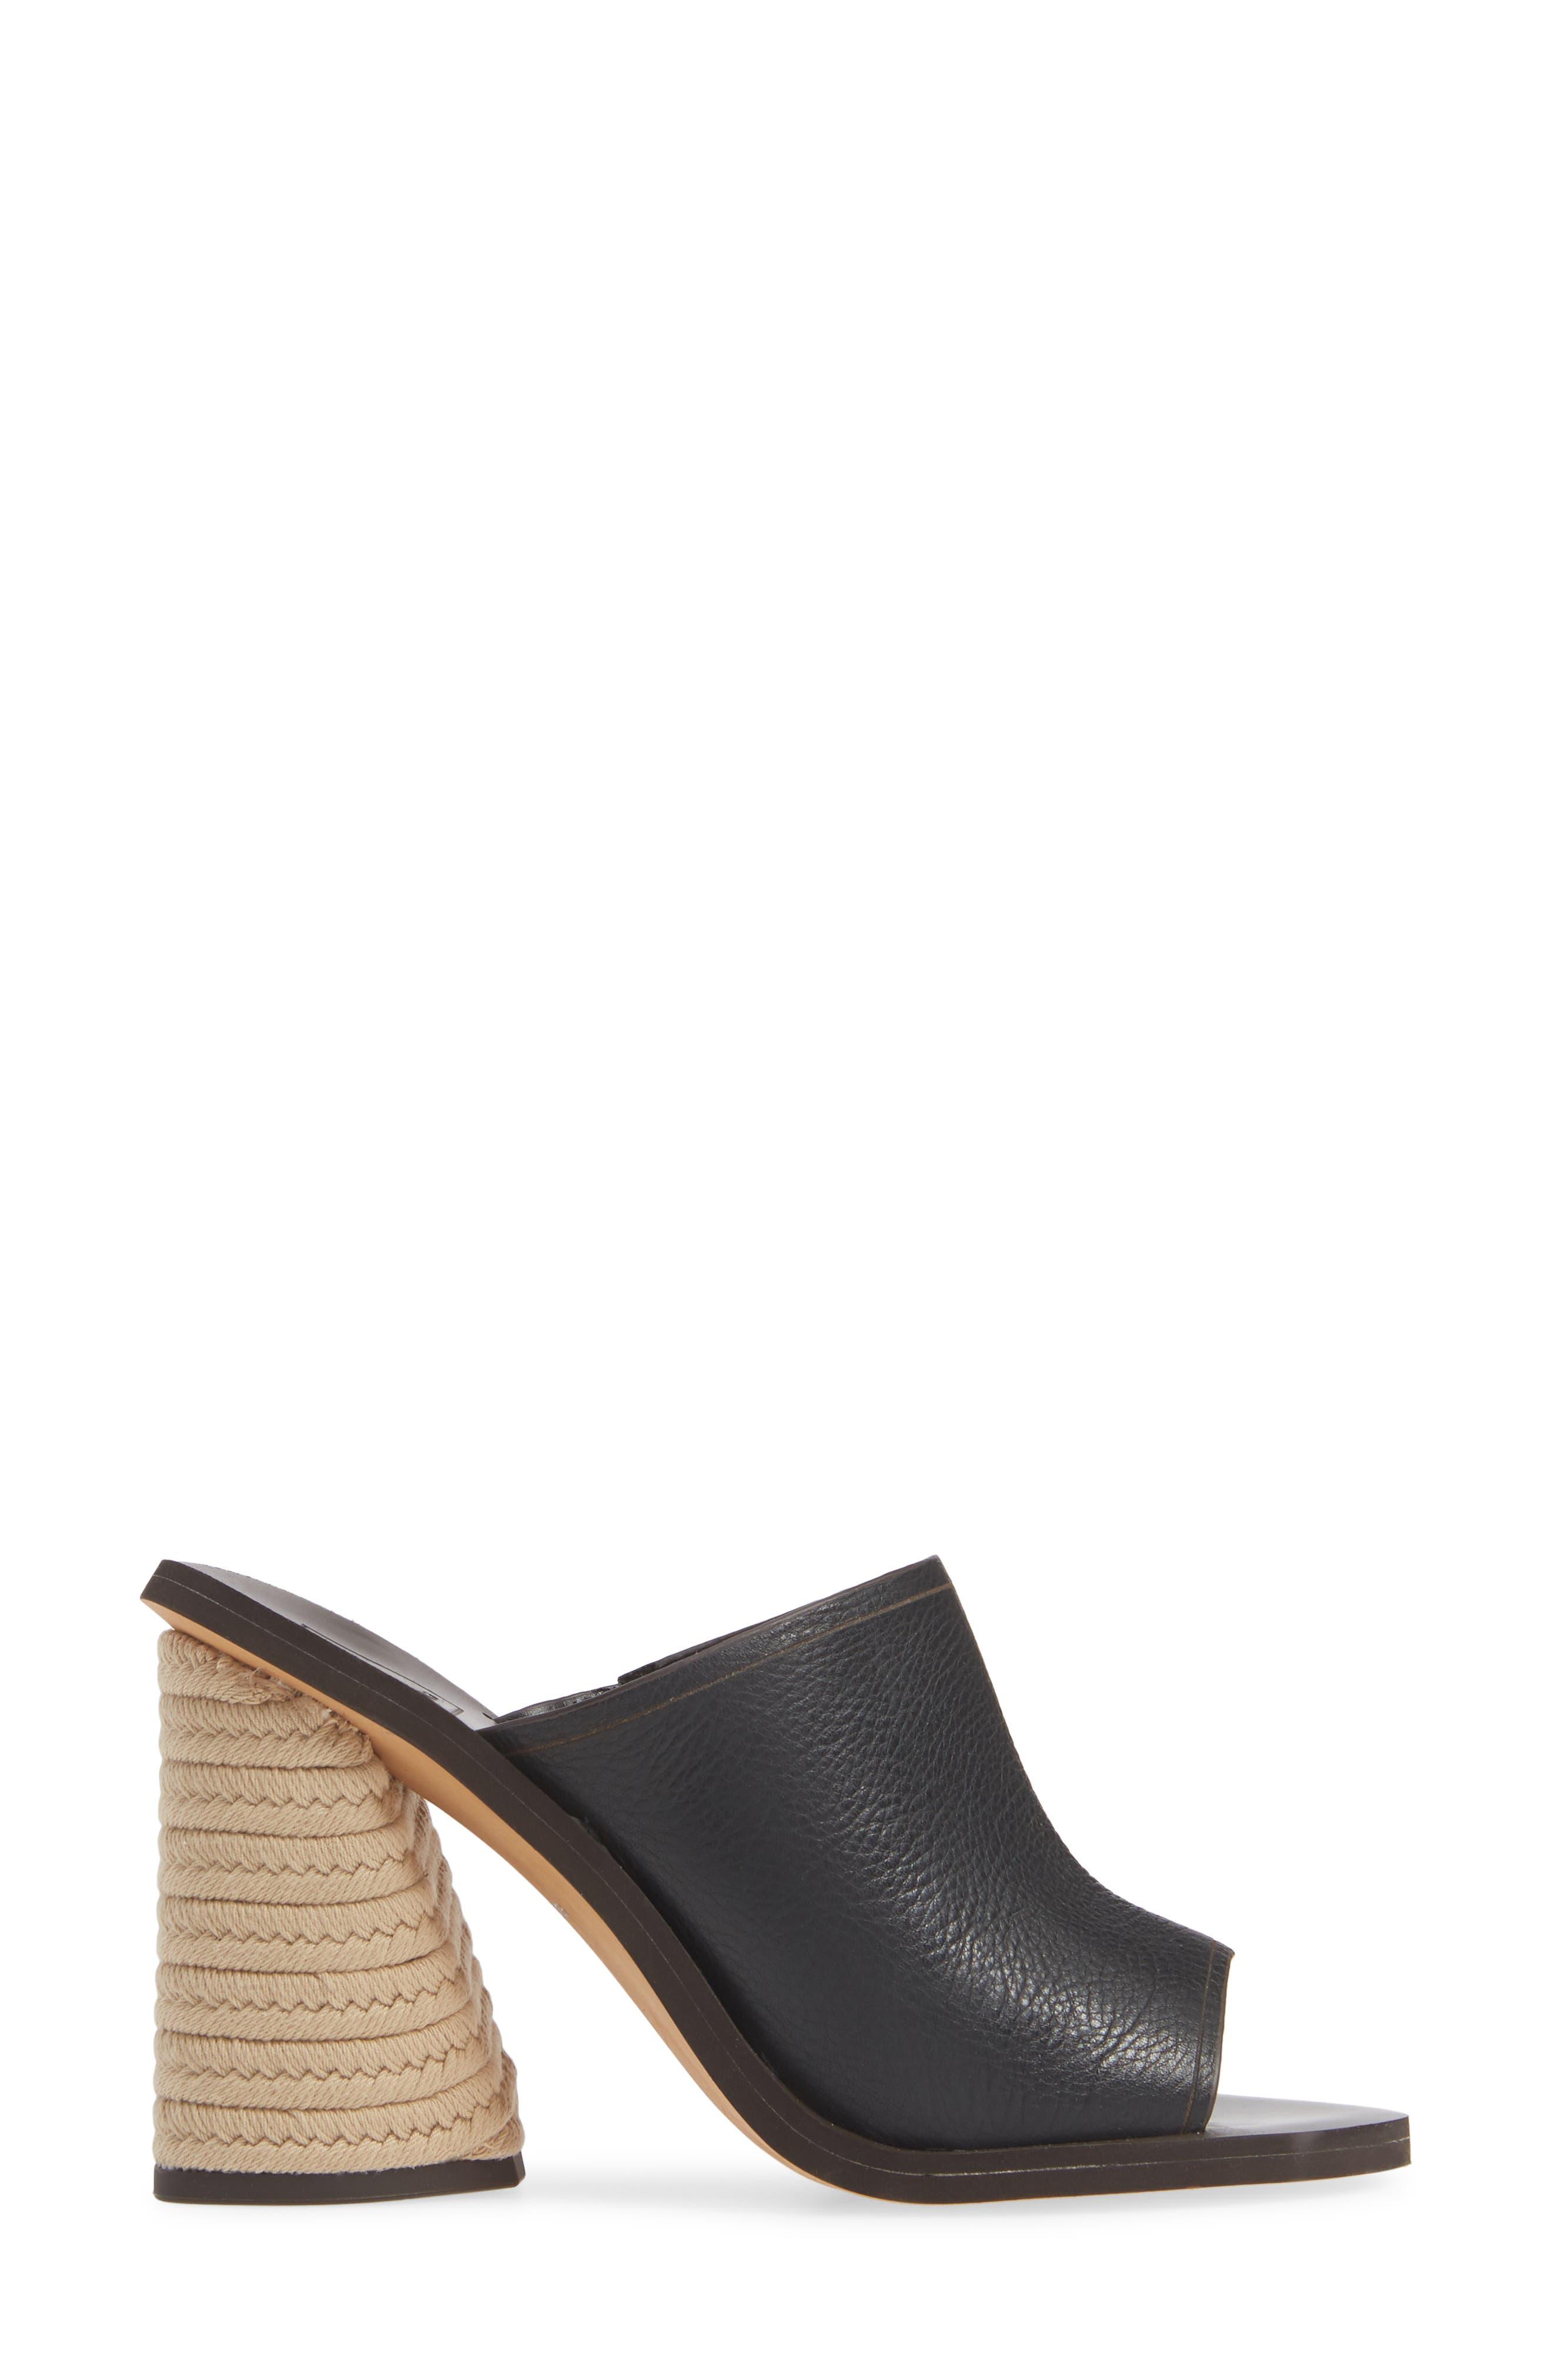 DOLCE VITA, Alba Braided Heel Mule Sandal, Alternate thumbnail 3, color, BLACK LEATHER